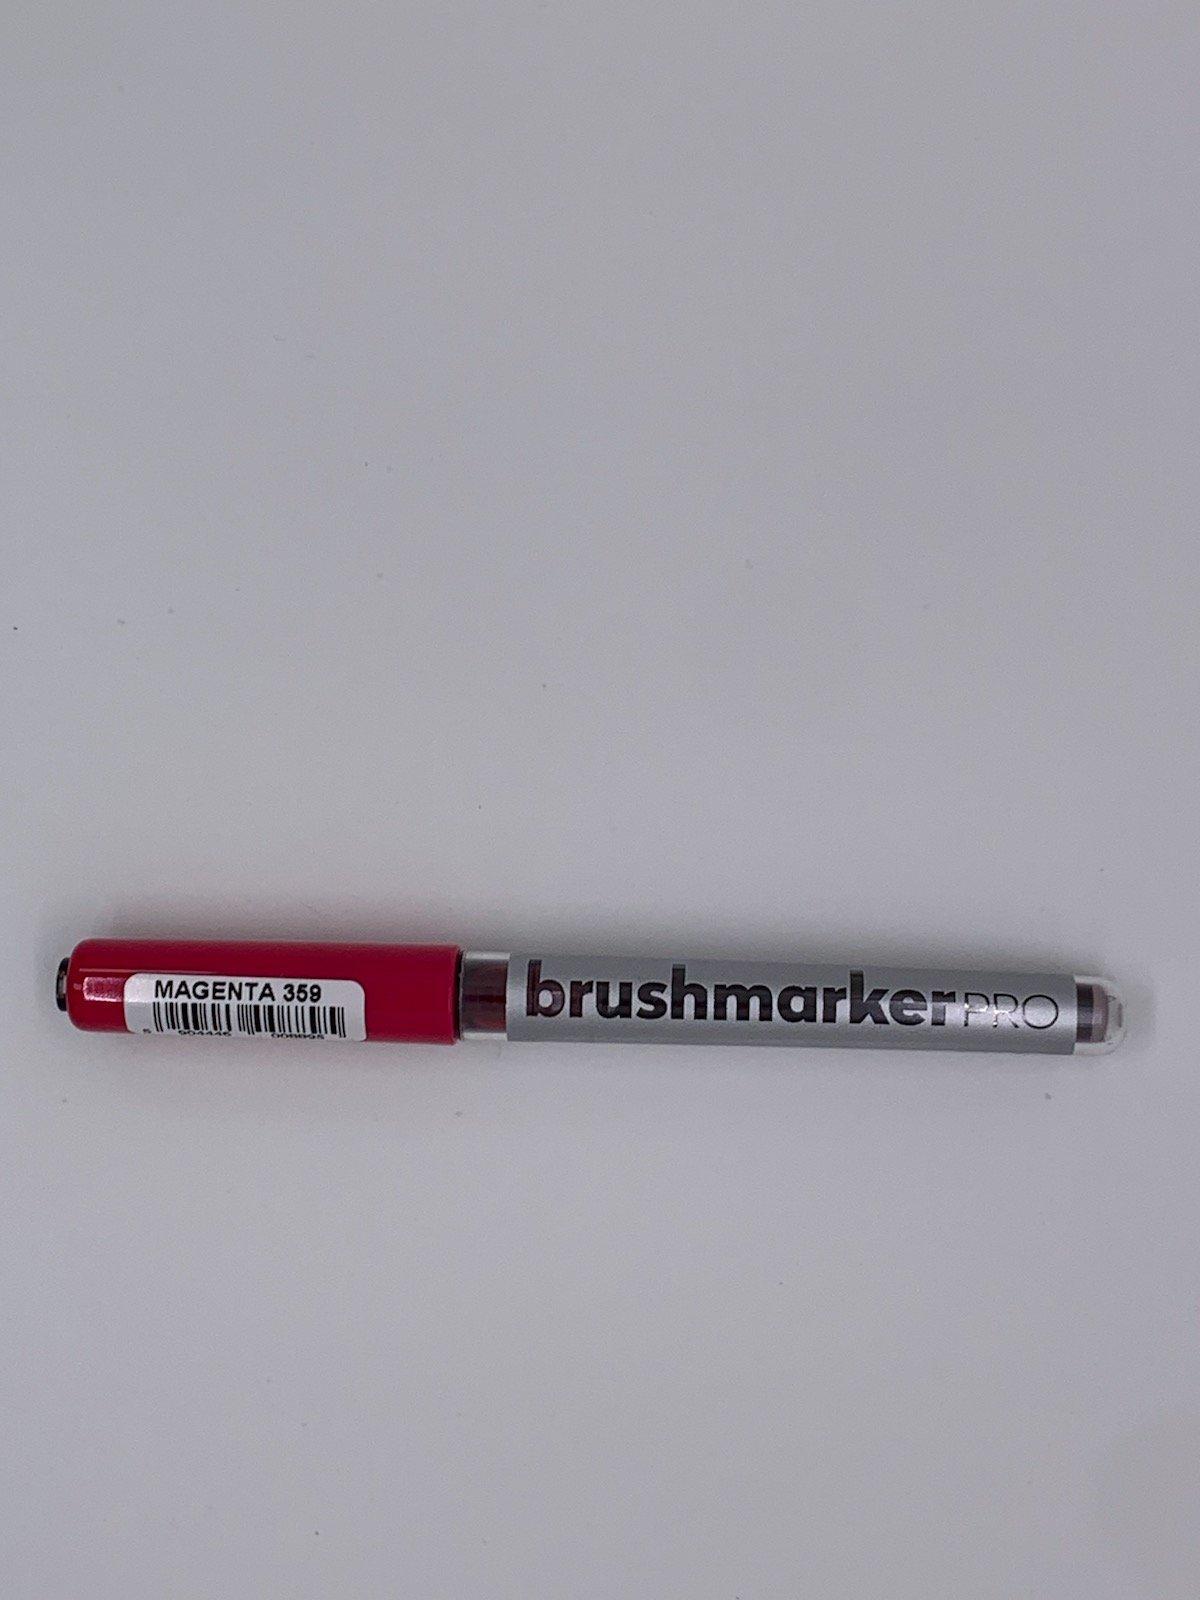 Brushmarker - Magenta